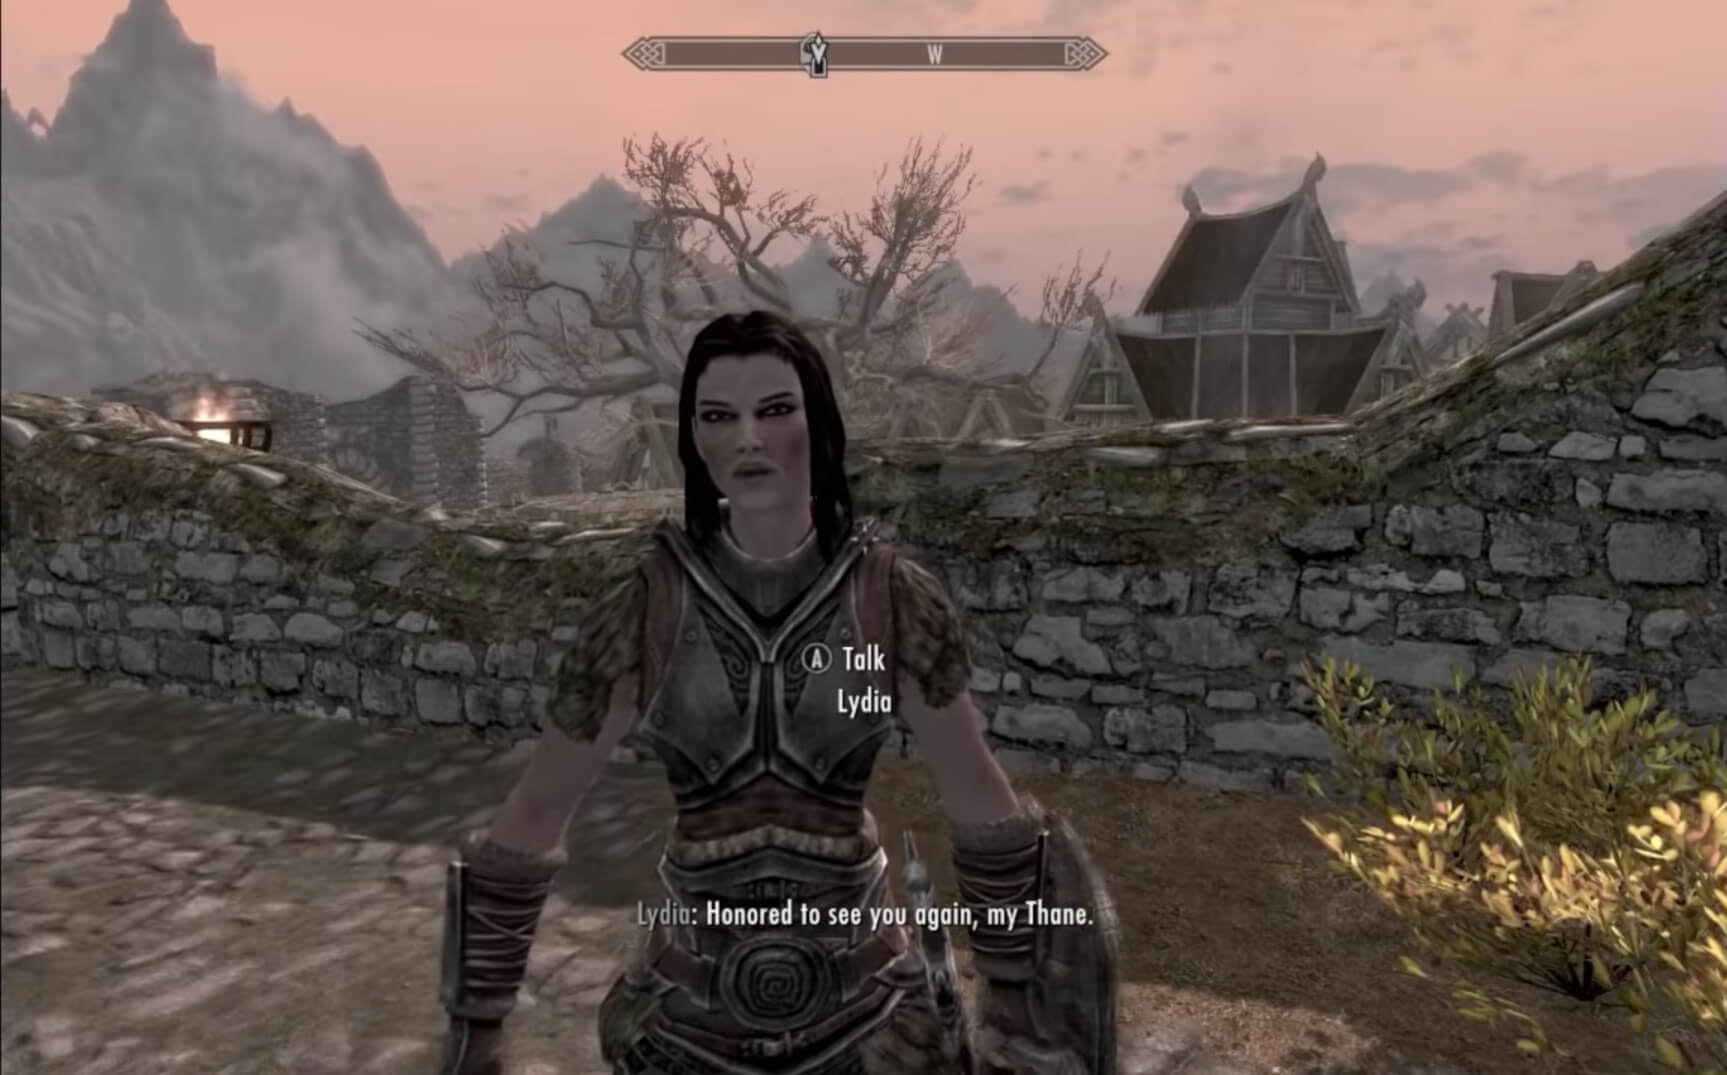 skyrim followers Lydia